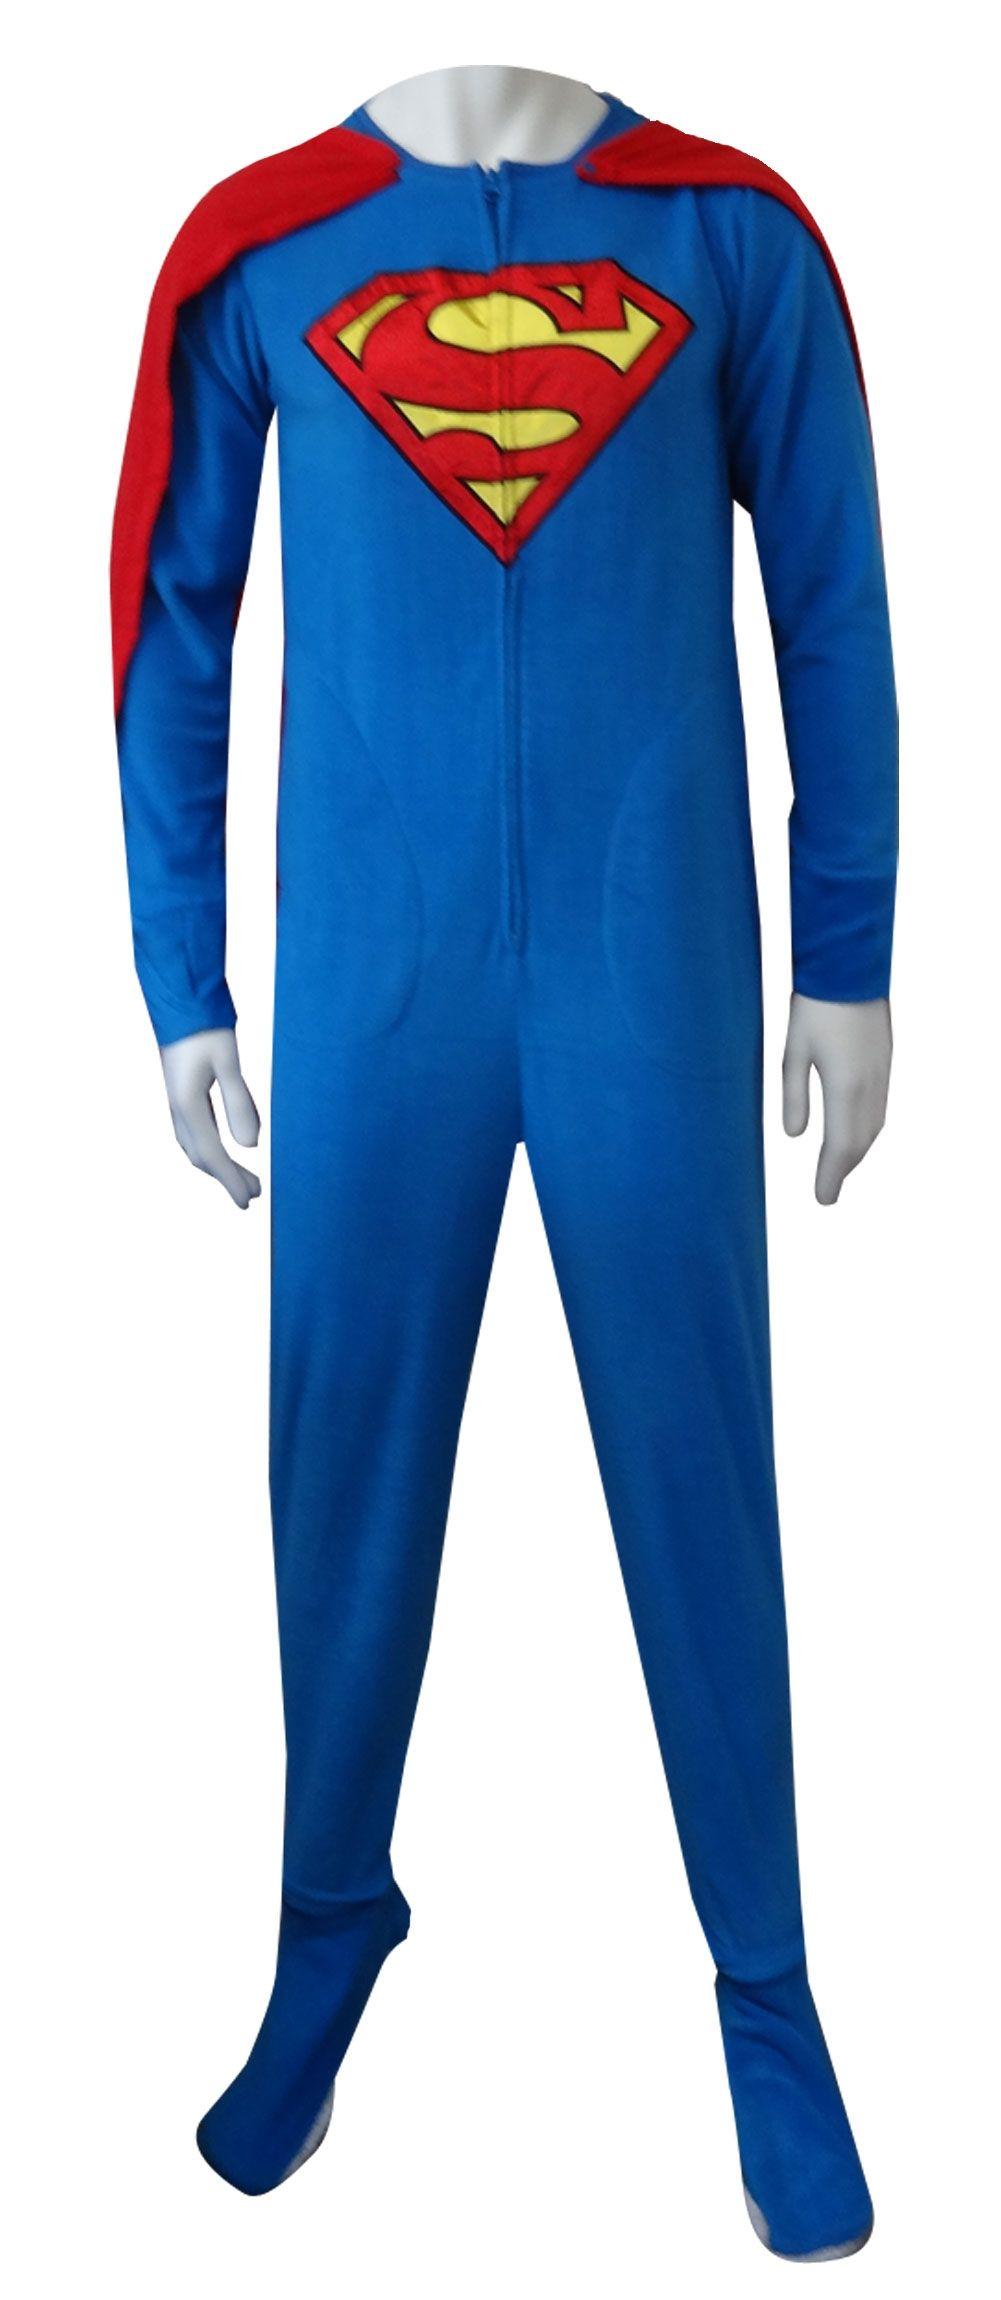 a6dc2a2867 WebUndies.com Superman   SuperGirl Fleece Onesie Footie Pajama with Cape